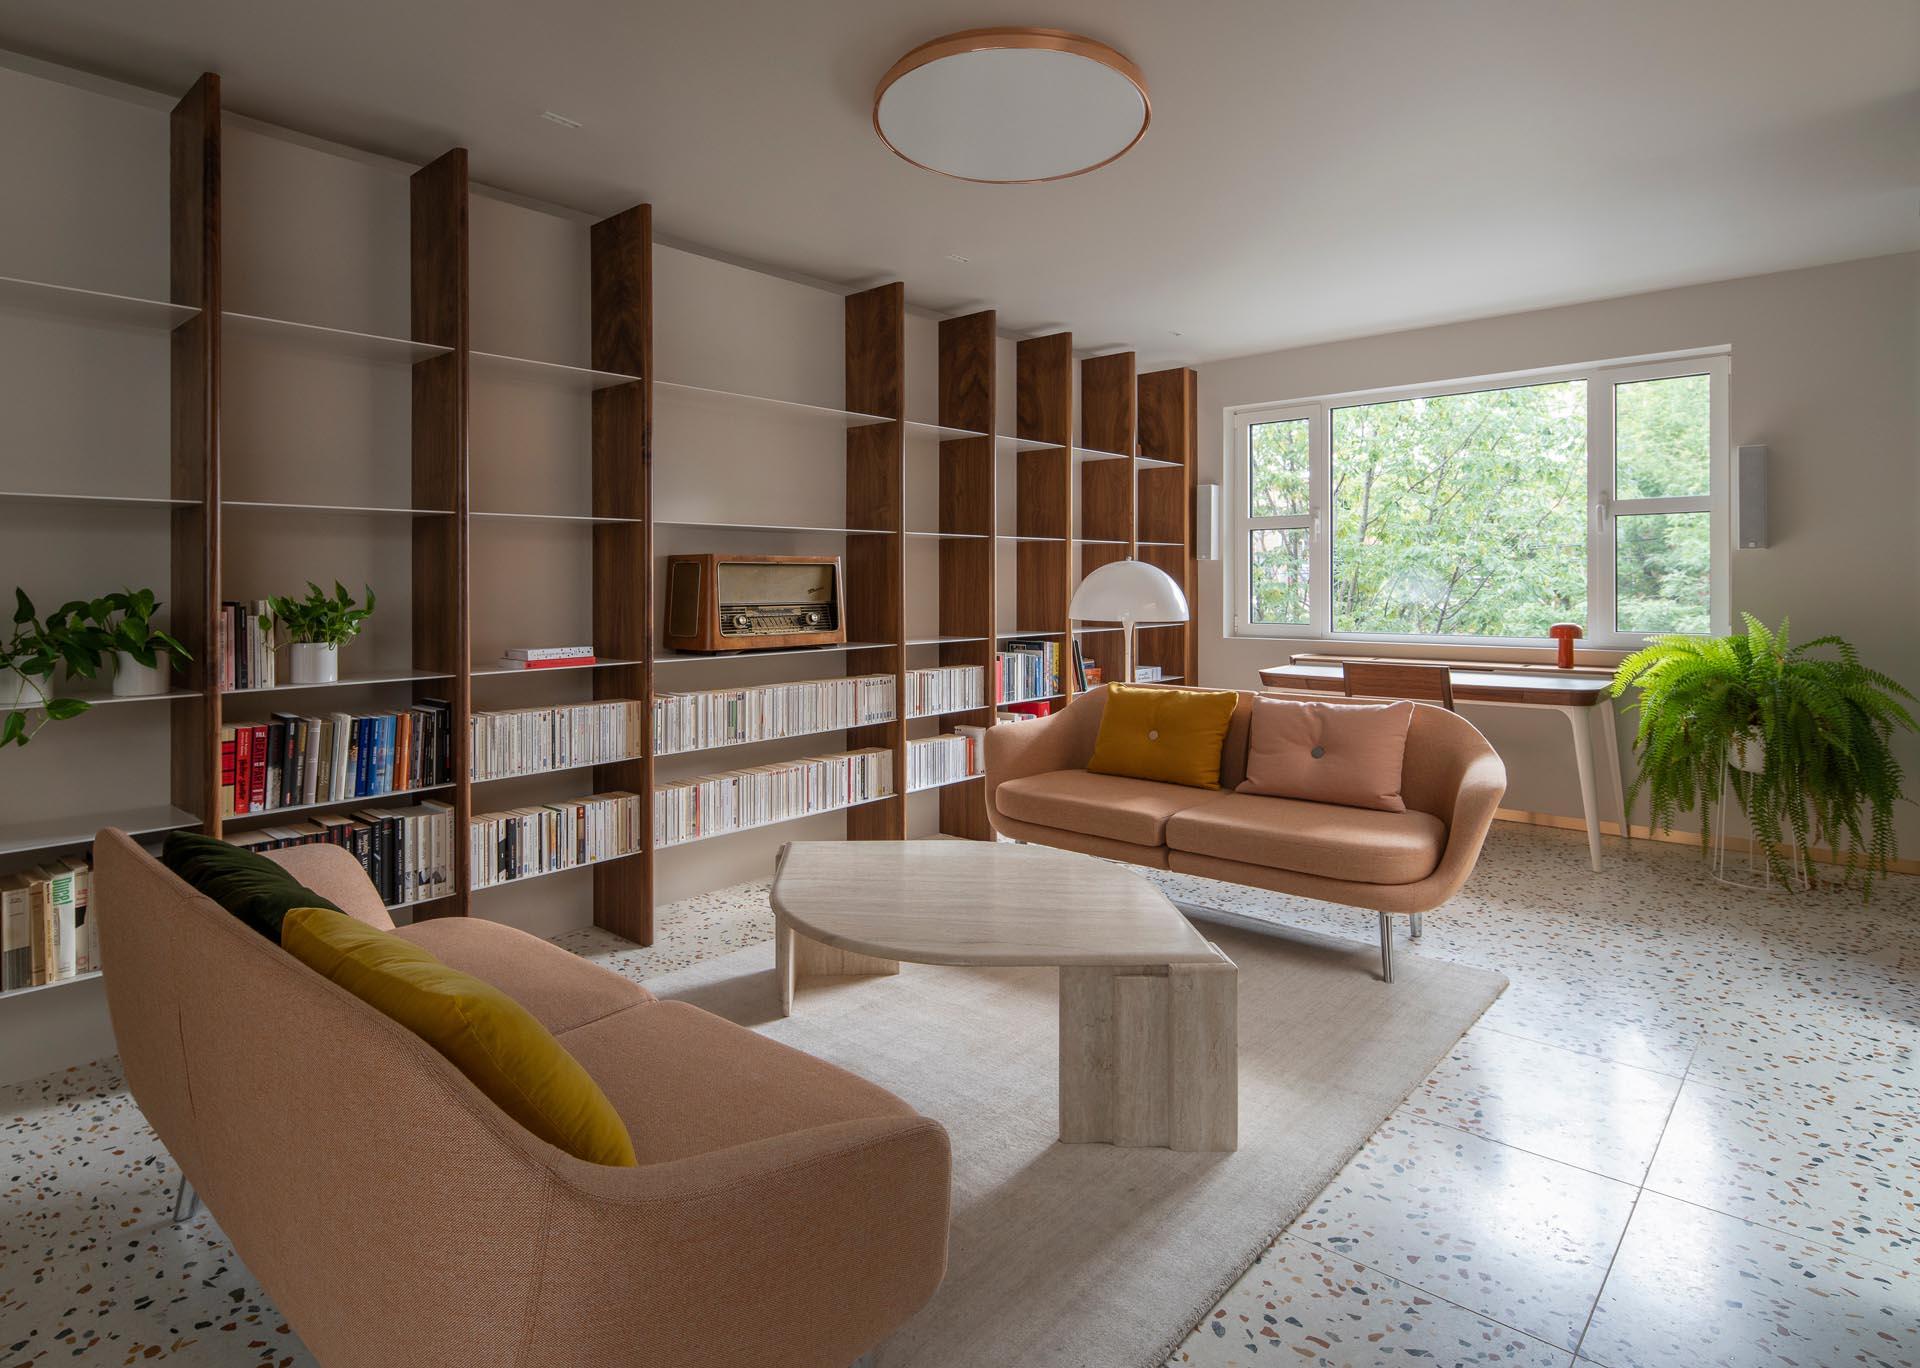 A modern living room with terrazzo tile floors, and a custom wood and metal bookshelf.